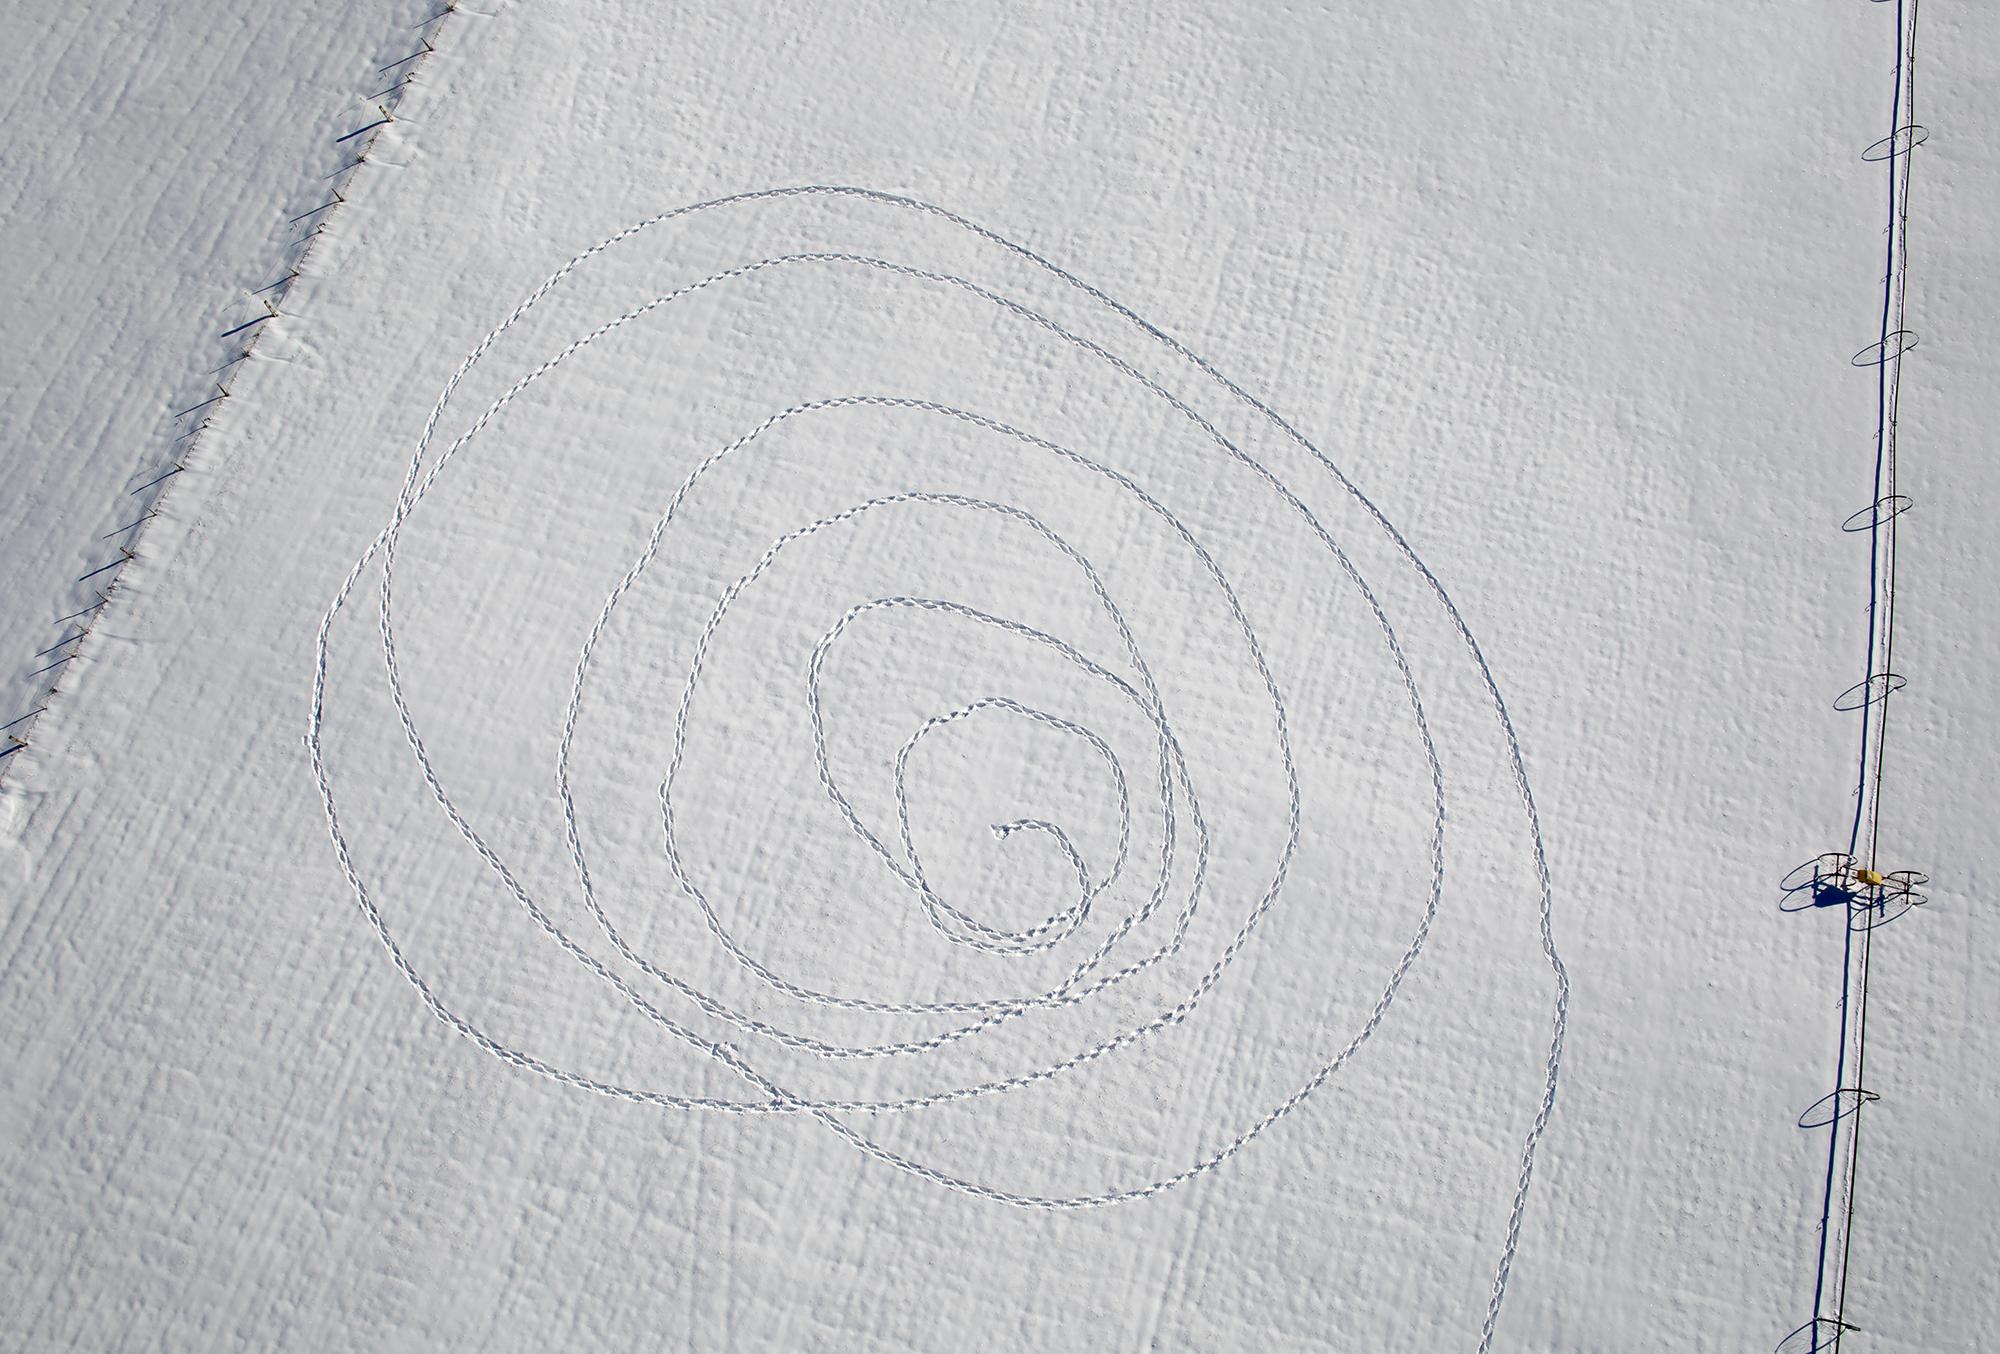 walking a spiral